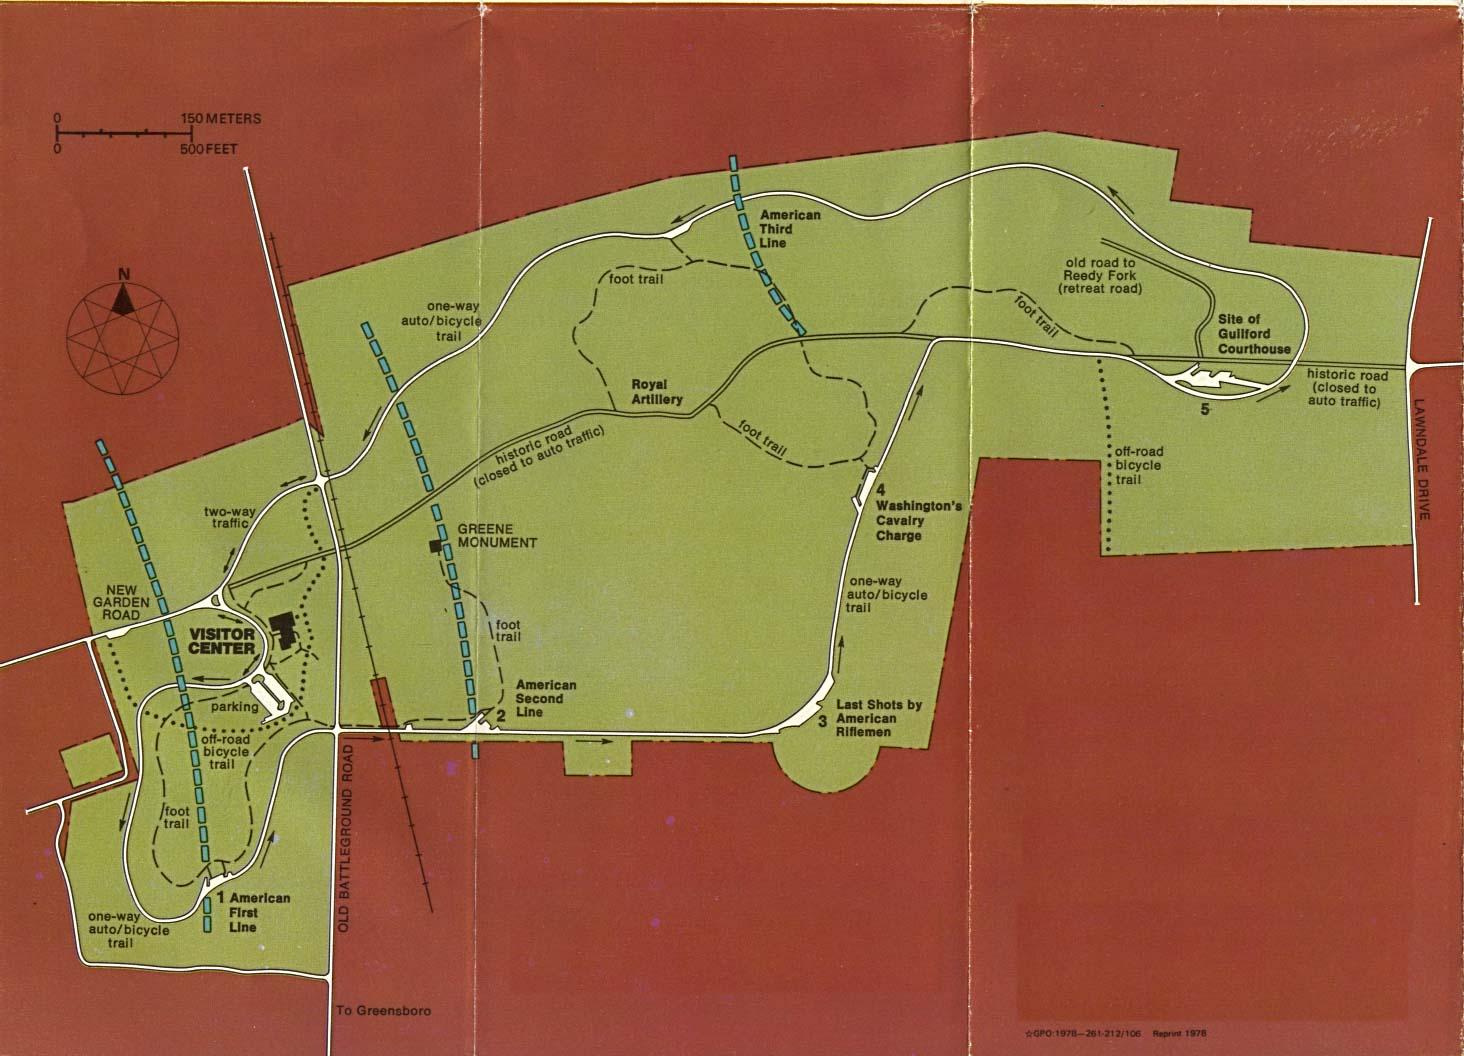 Mapa del Parque Militar Nacional de Guilford Courthouse, Carolina del Norte, Estados Unidos